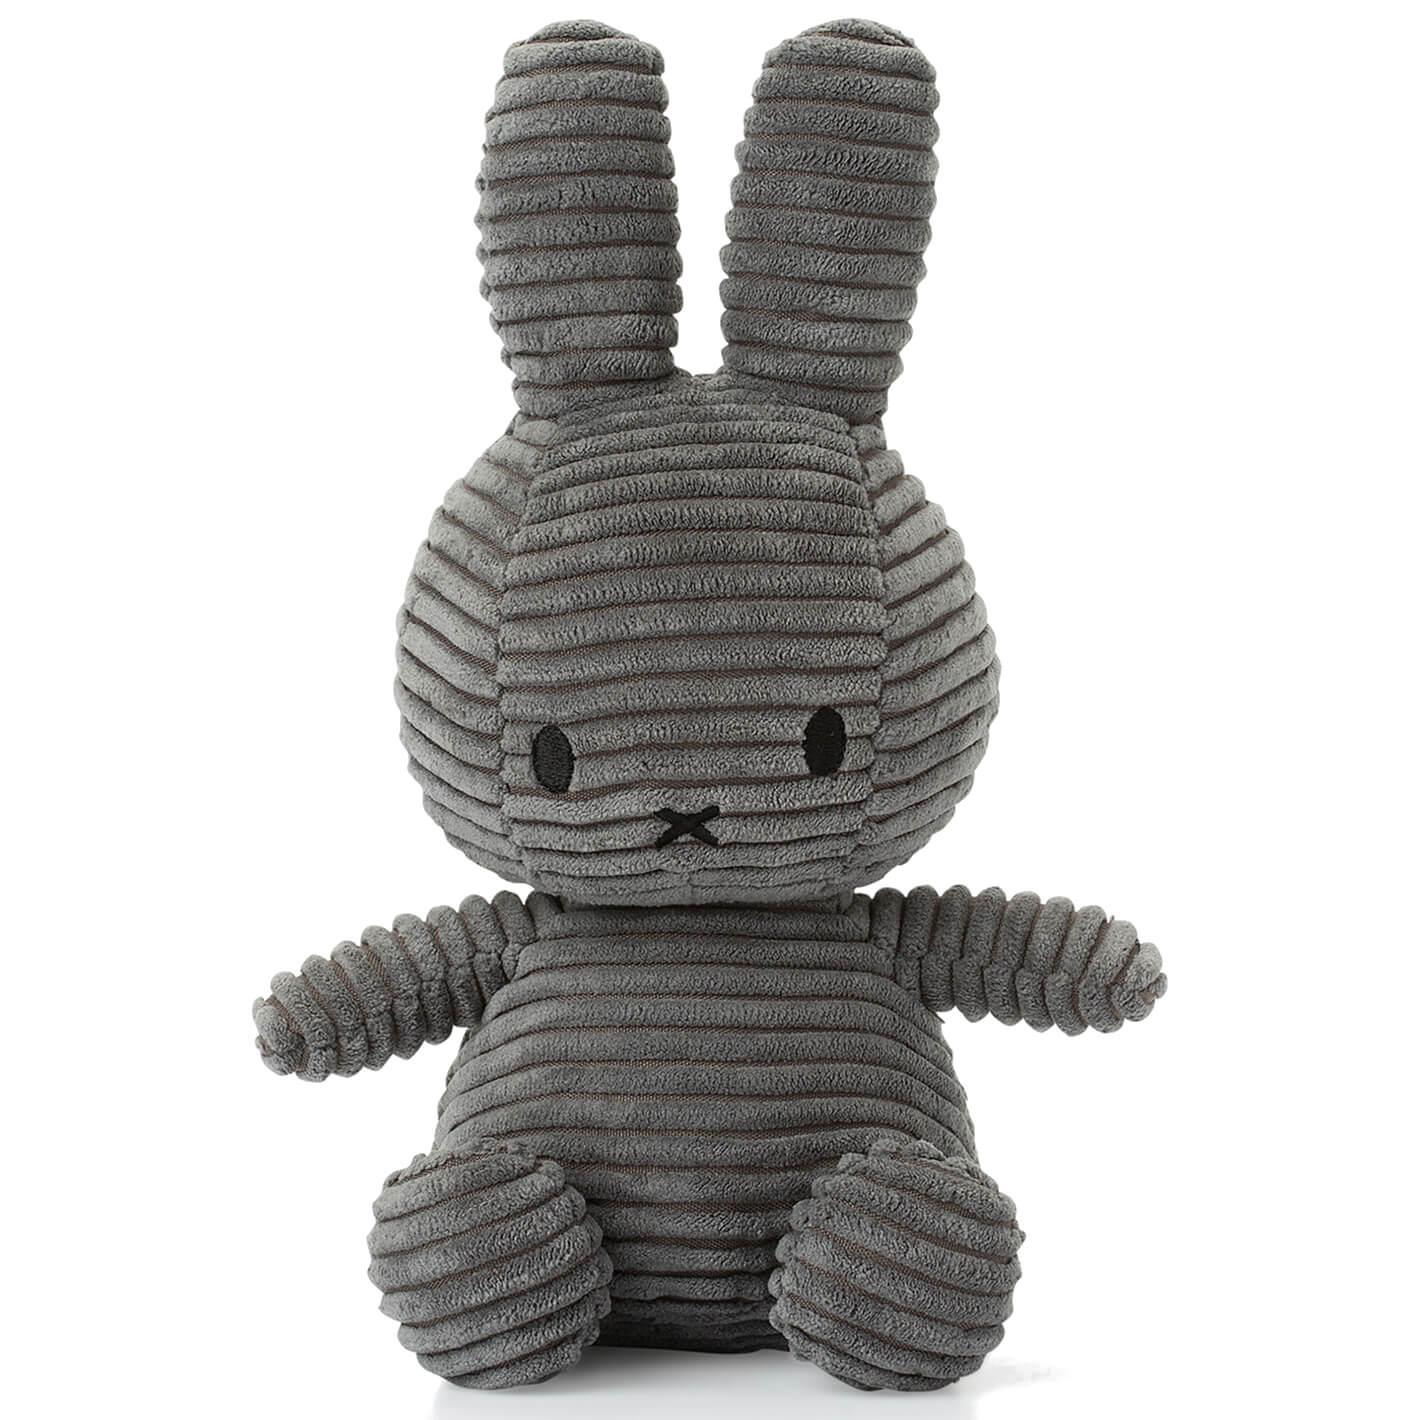 Sitting Miffy Toy - Grey Corduroy